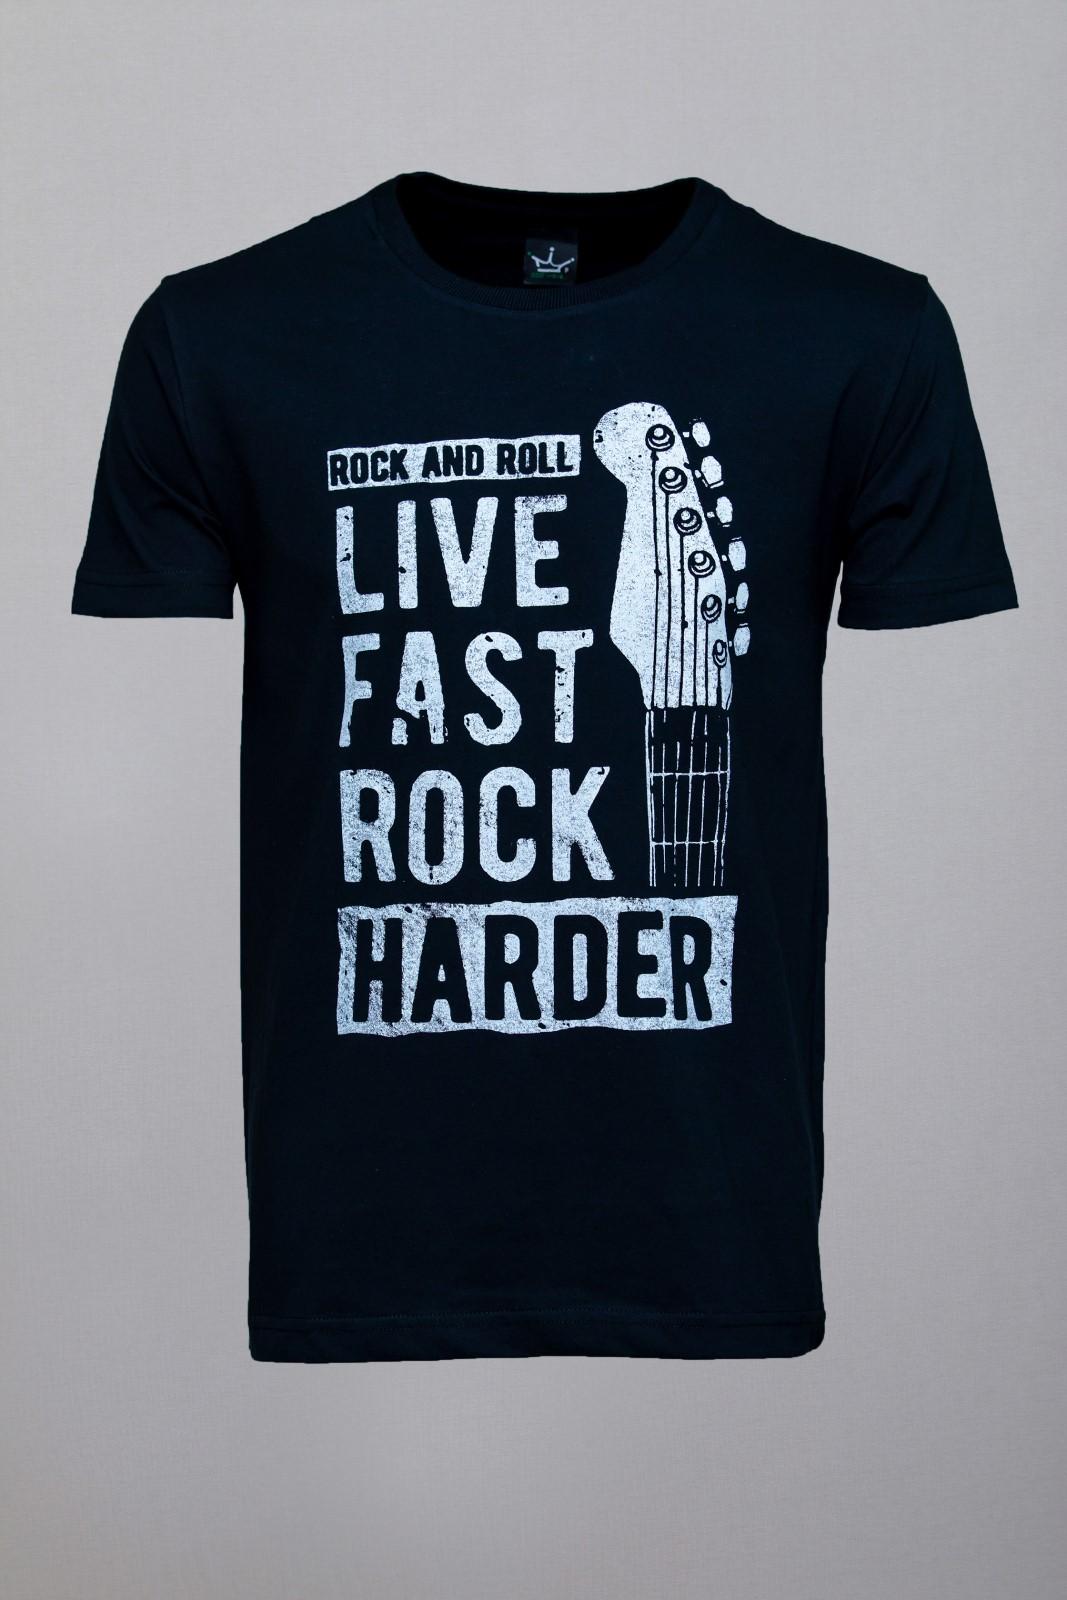 Camiseta CoolWave Live, Fast, Rock, Harder Preta